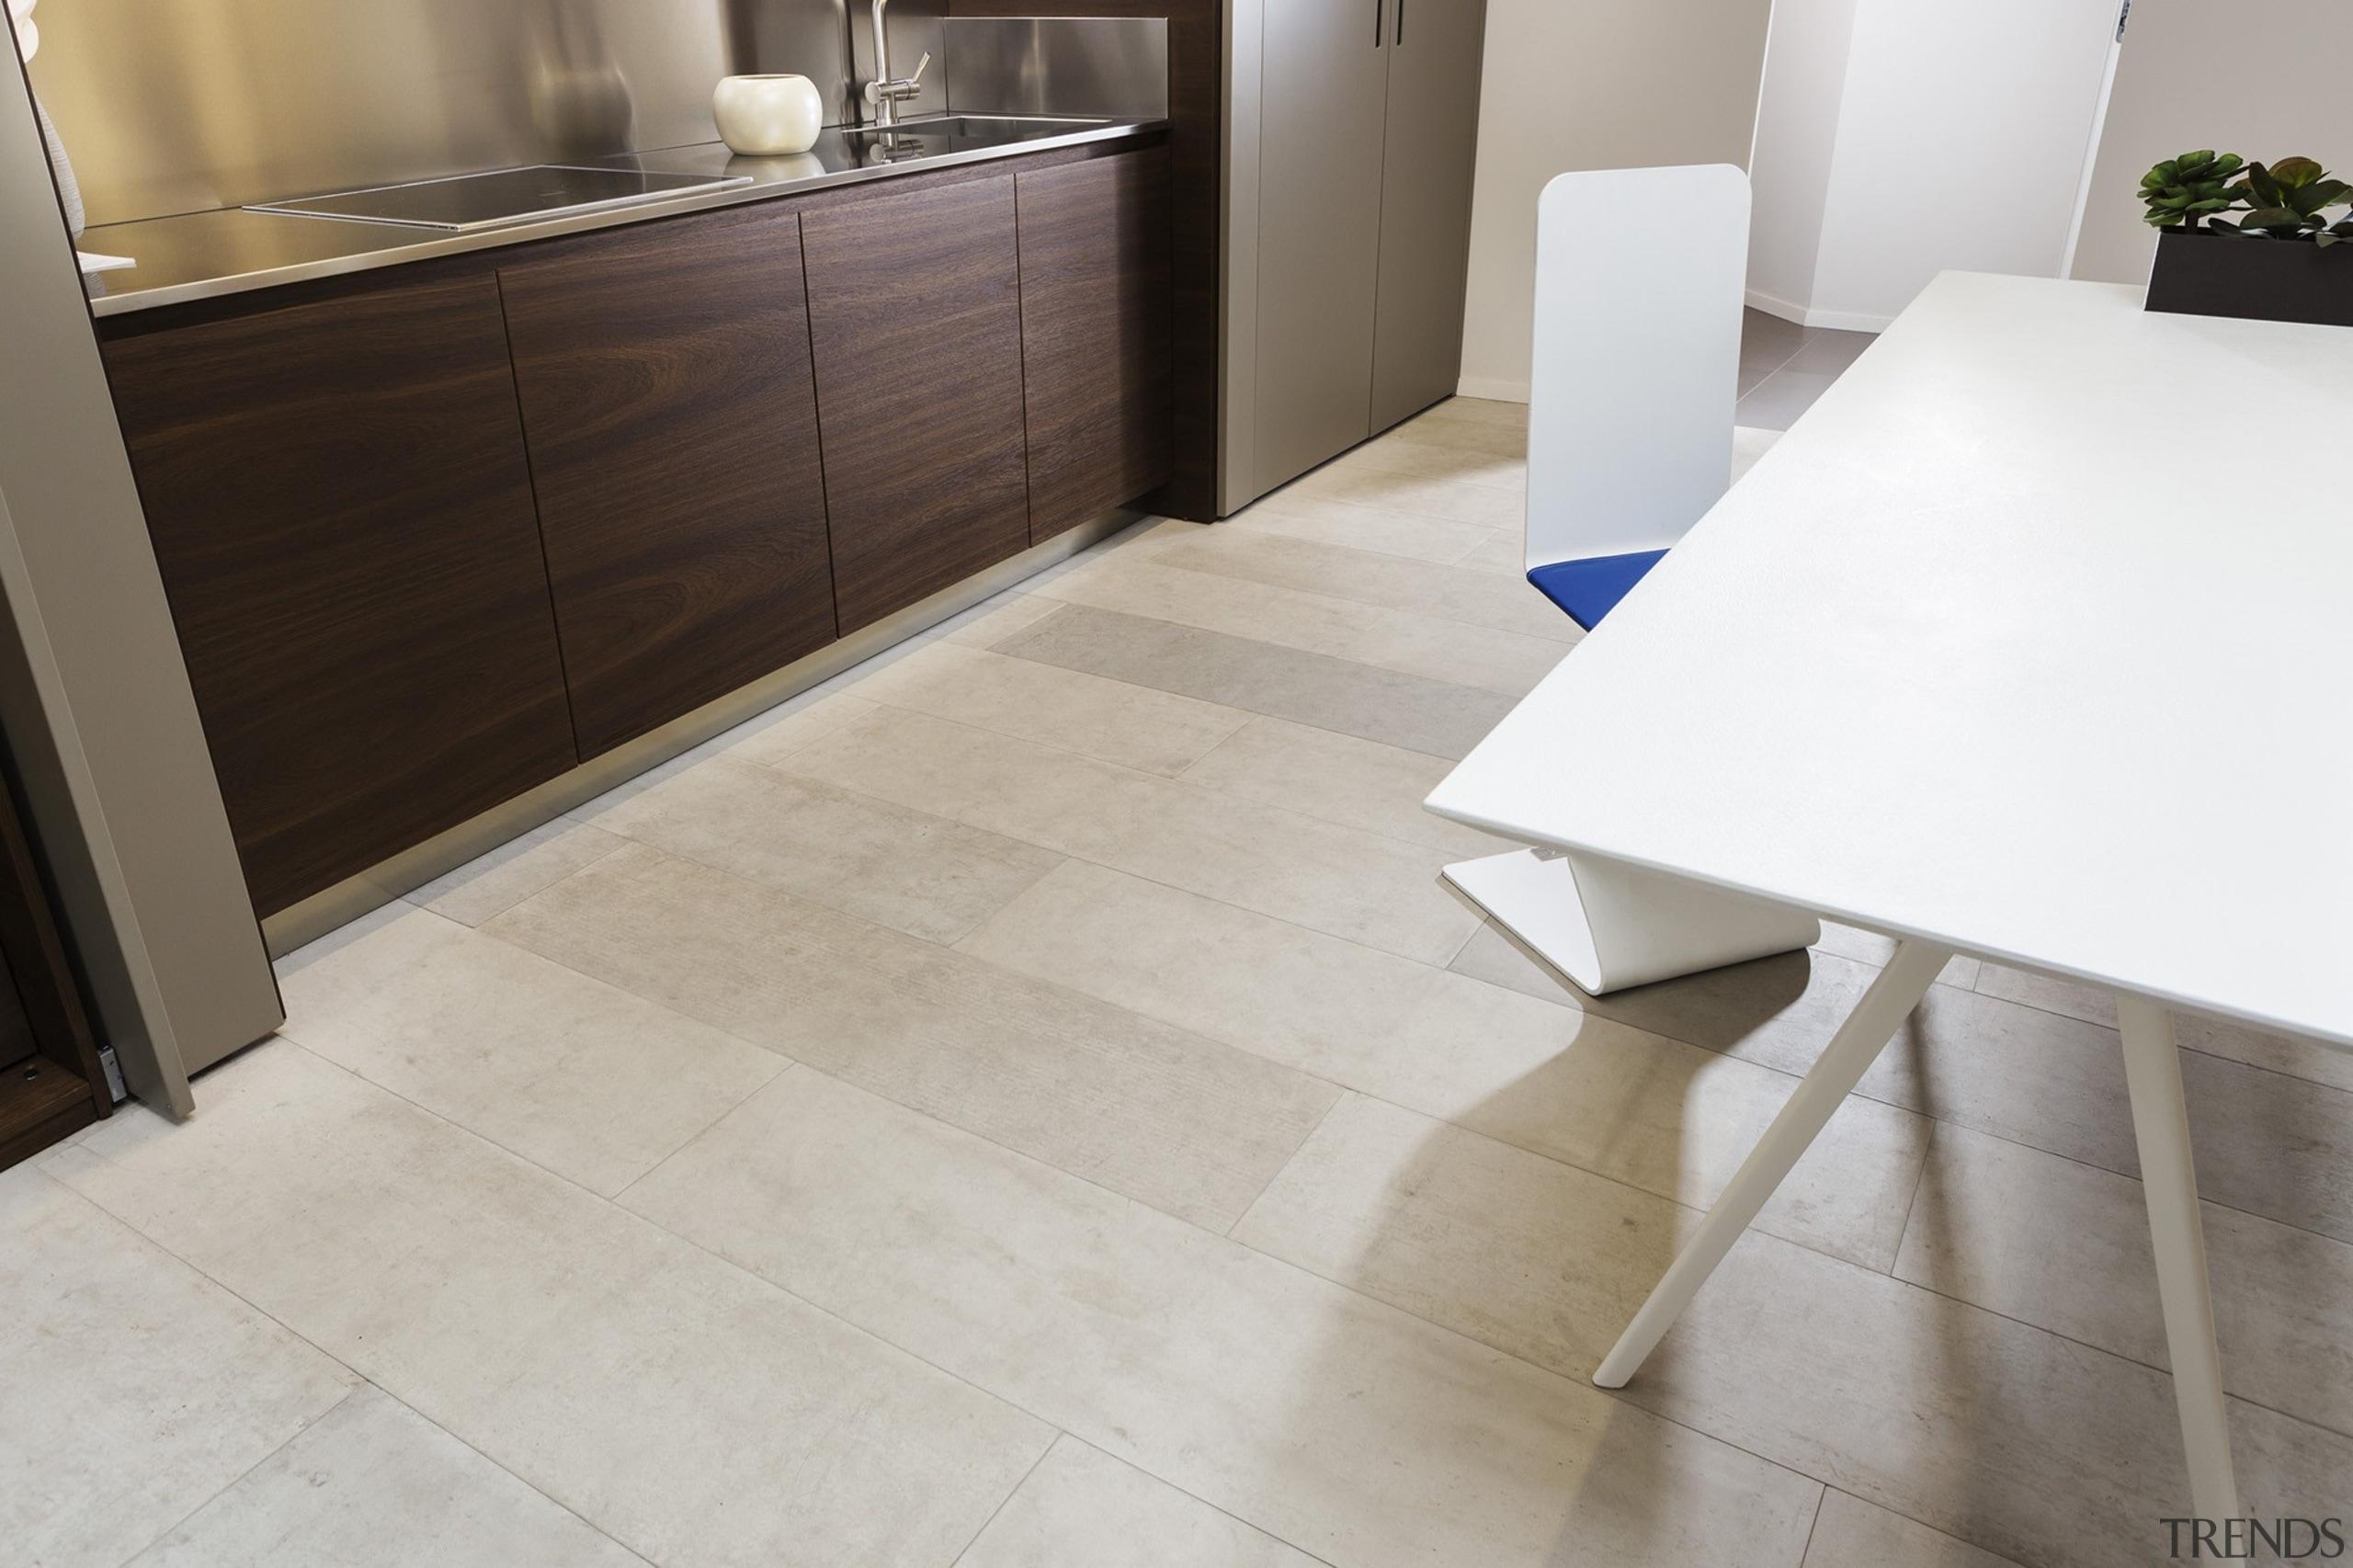 413_italy - floor | flooring | furniture | floor, flooring, furniture, hardwood, interior design, laminate flooring, product design, property, table, tile, wall, wood, wood flooring, gray